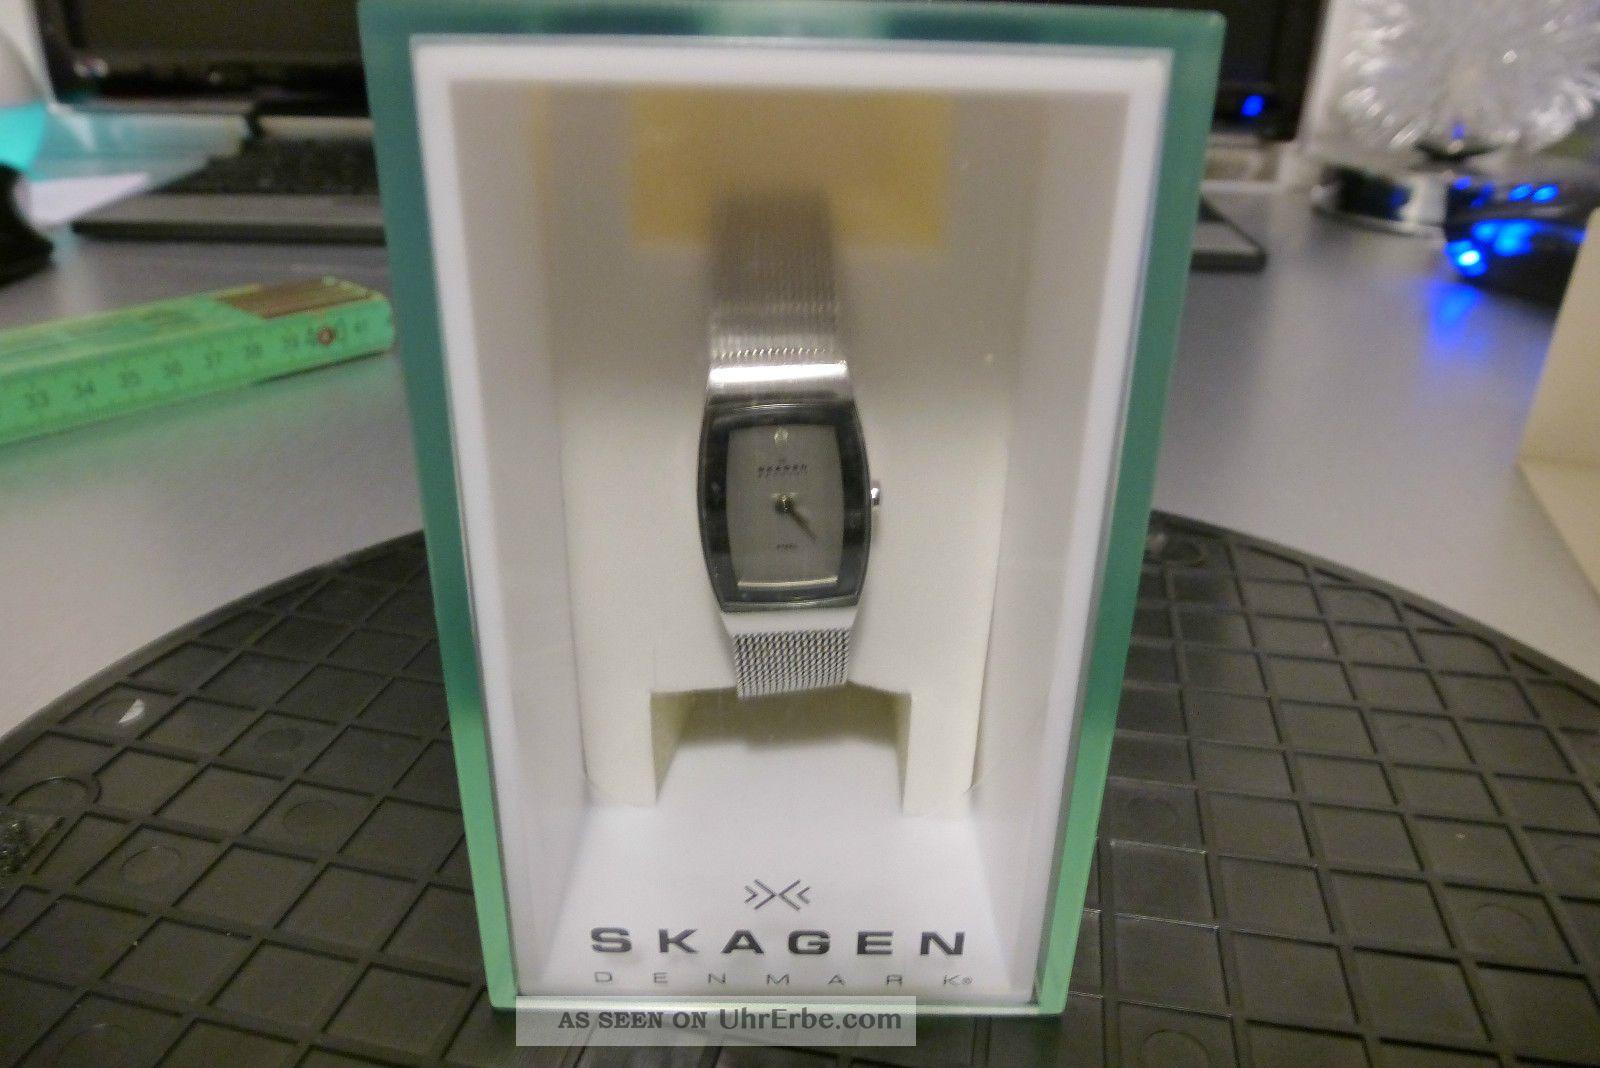 Skagen 271 Sssd Damenuhr 271sssd Armbanduhren Bild